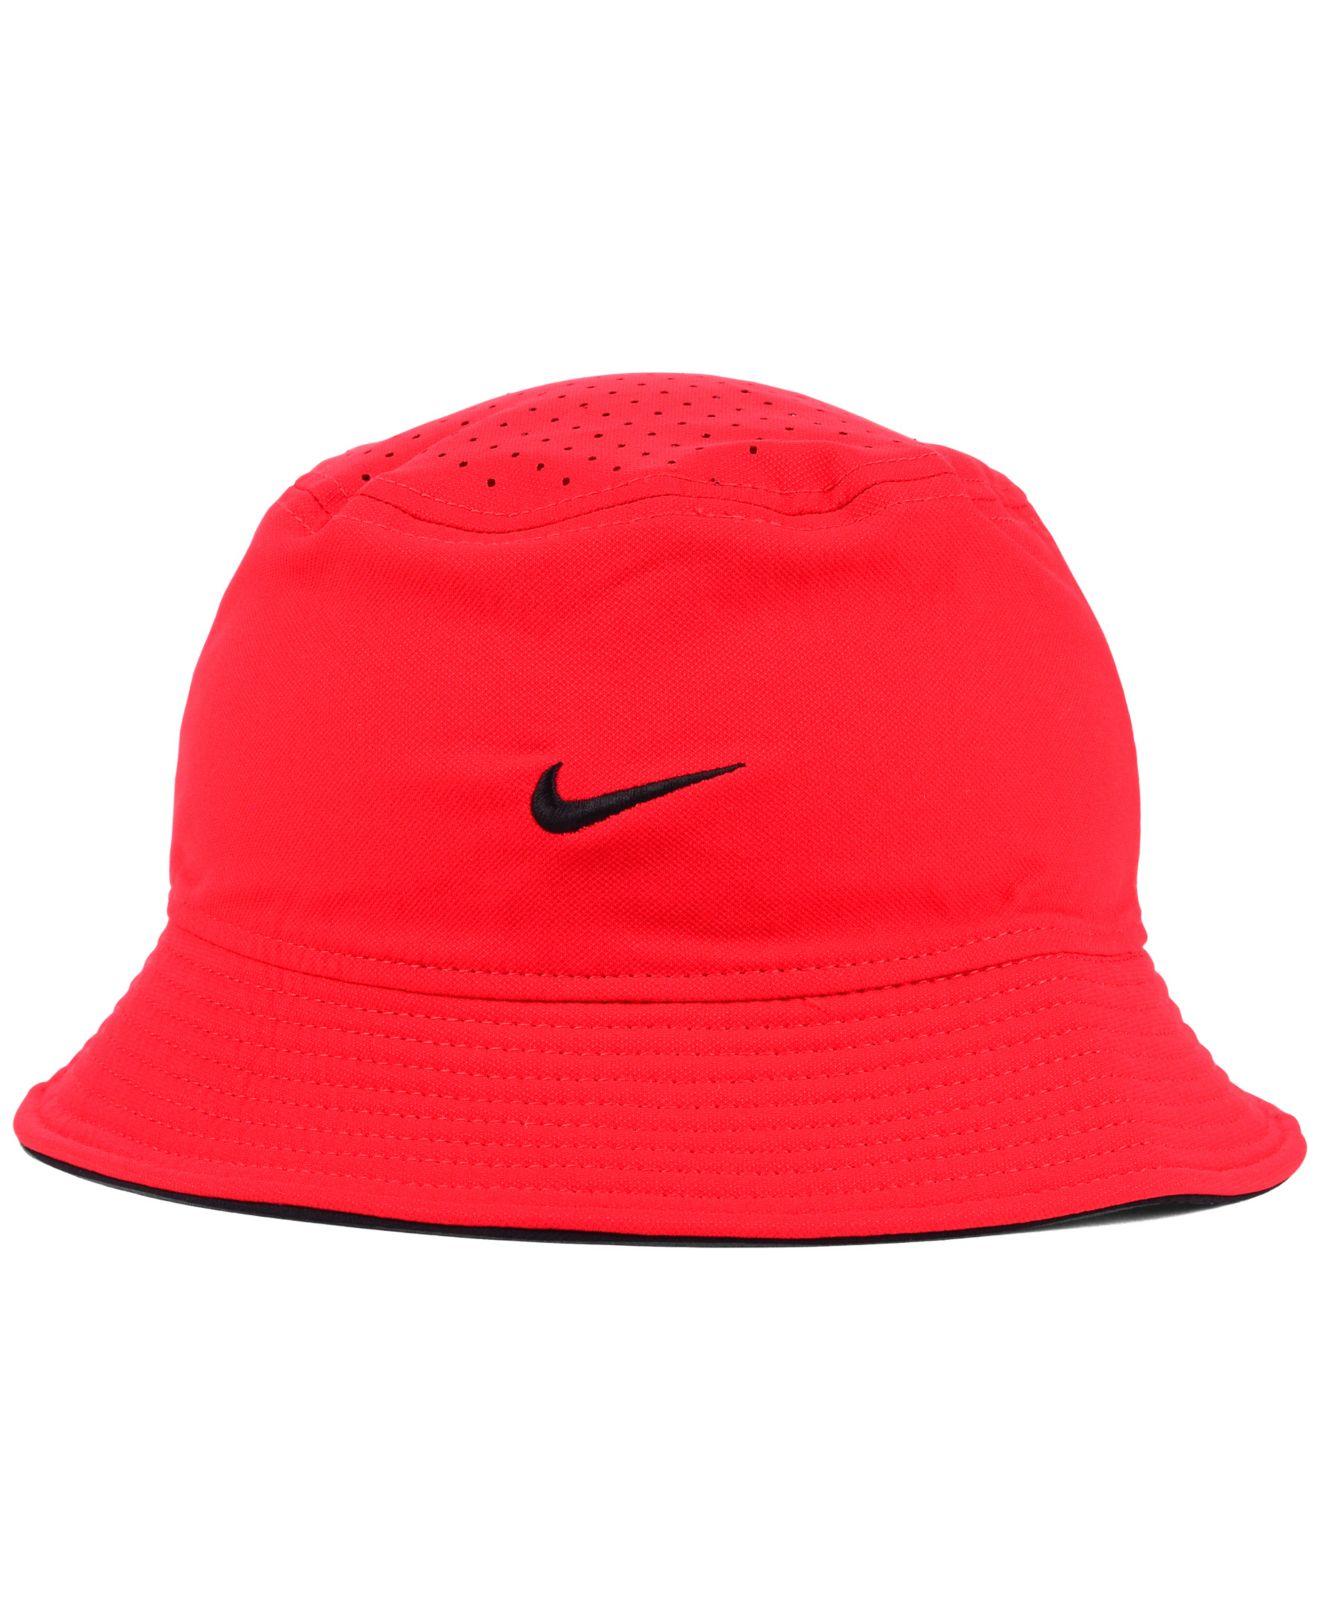 5dd21d527653 Nike Georgia Bulldogs Vapor Bucket Hat in Red for Men - Lyst